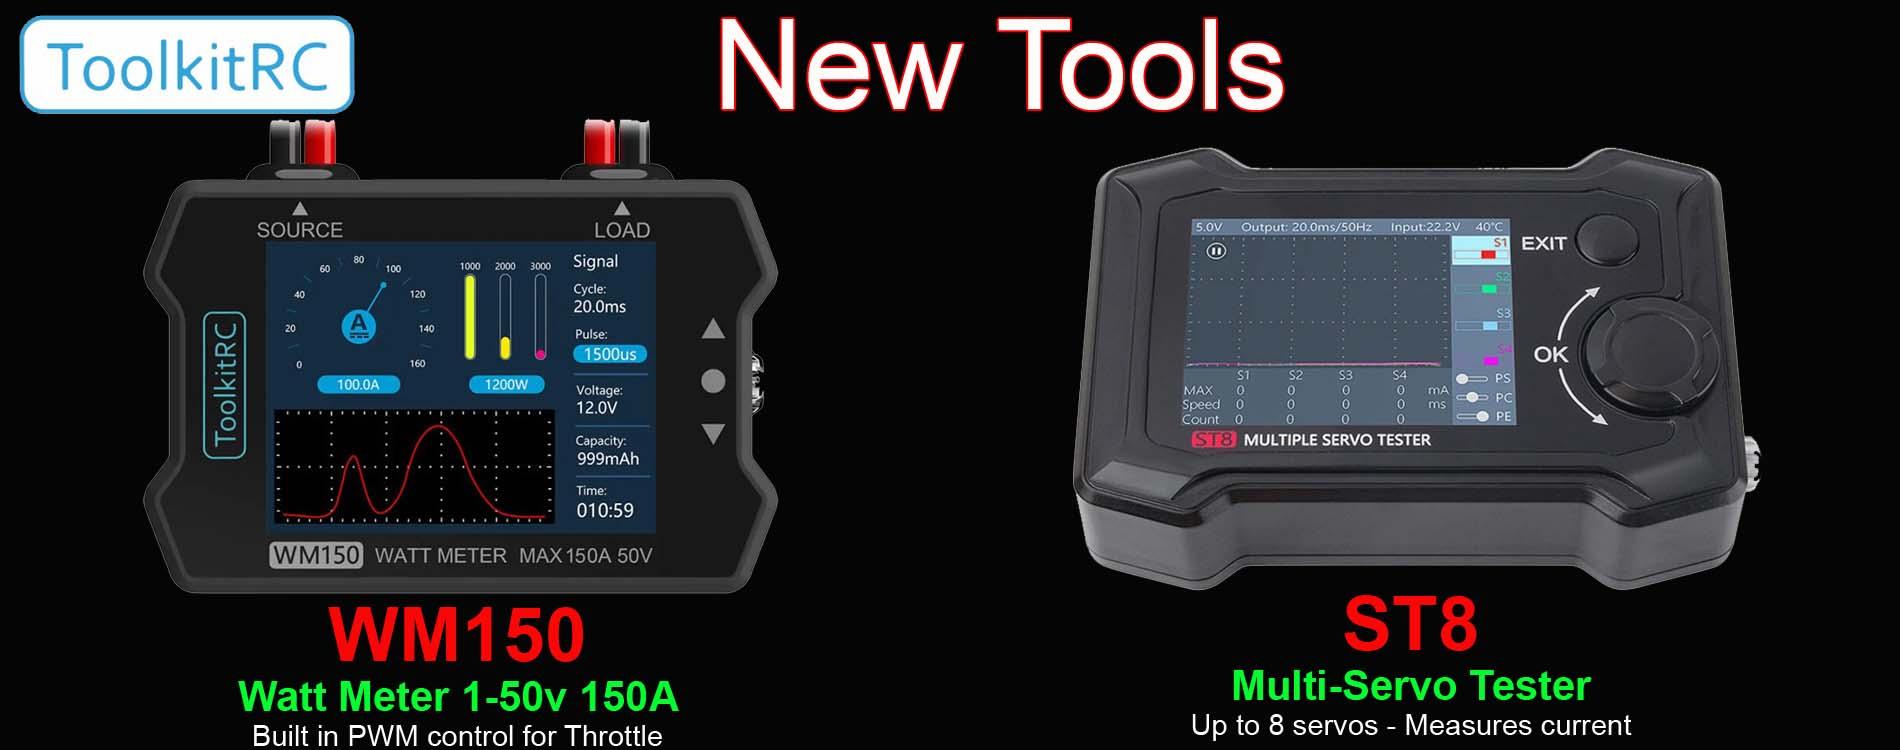 ToolkitRC Tools